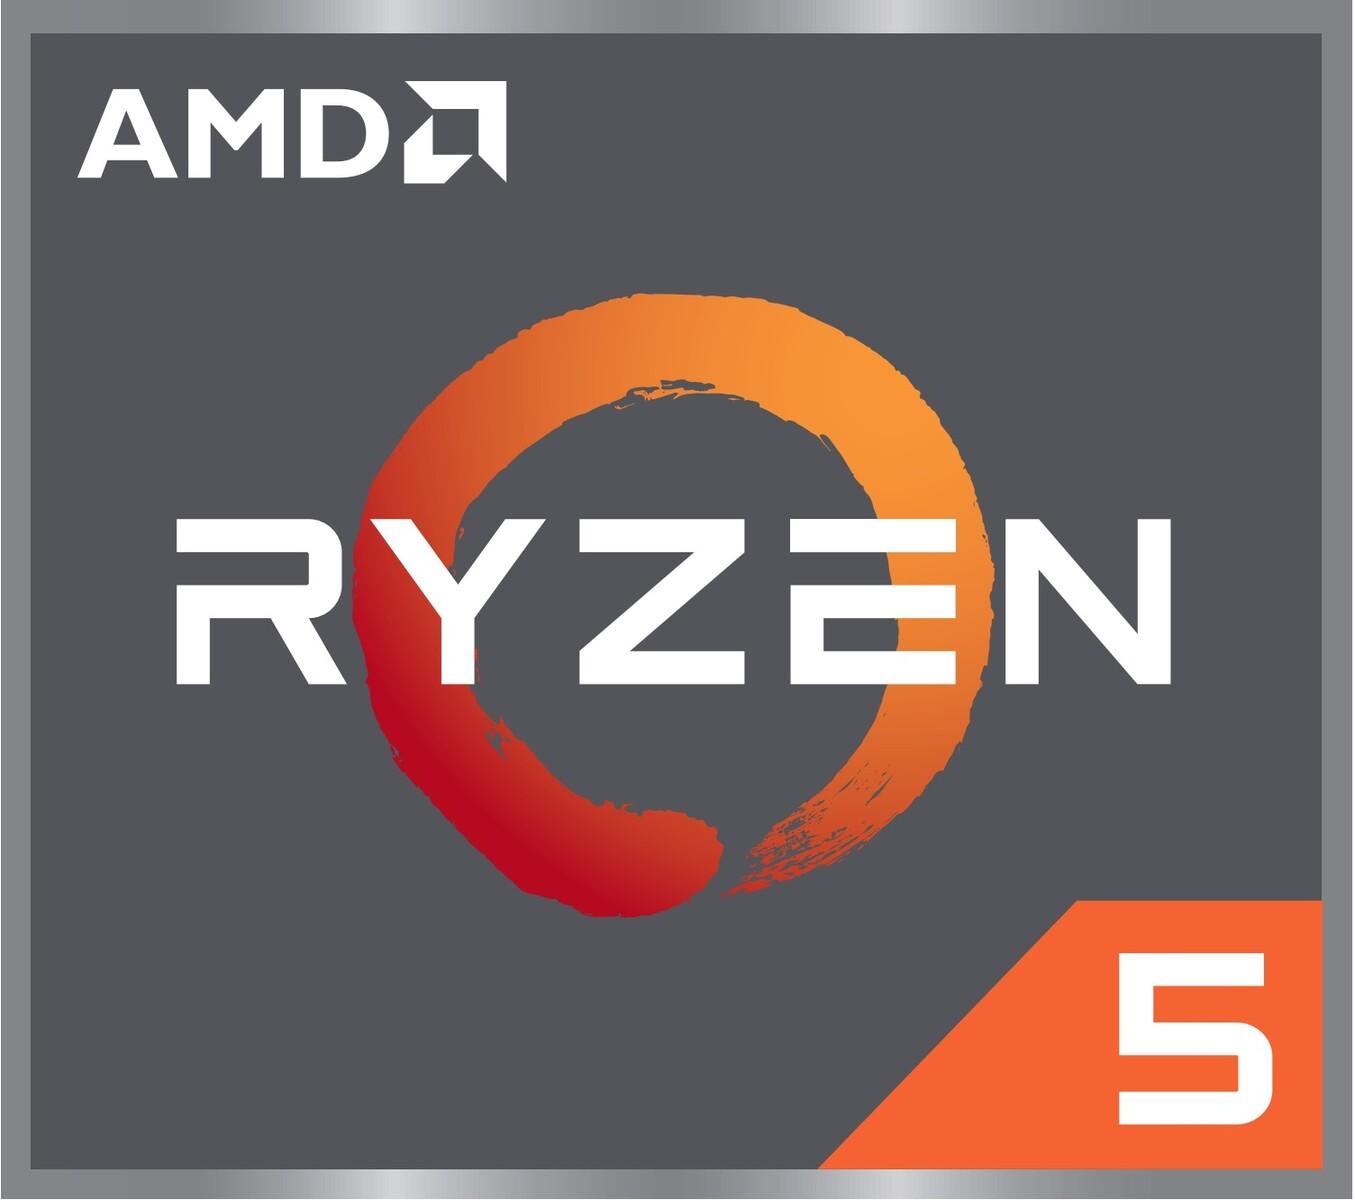 Amd Ryzen 5 3550h Vs Intel Core I5 9300h